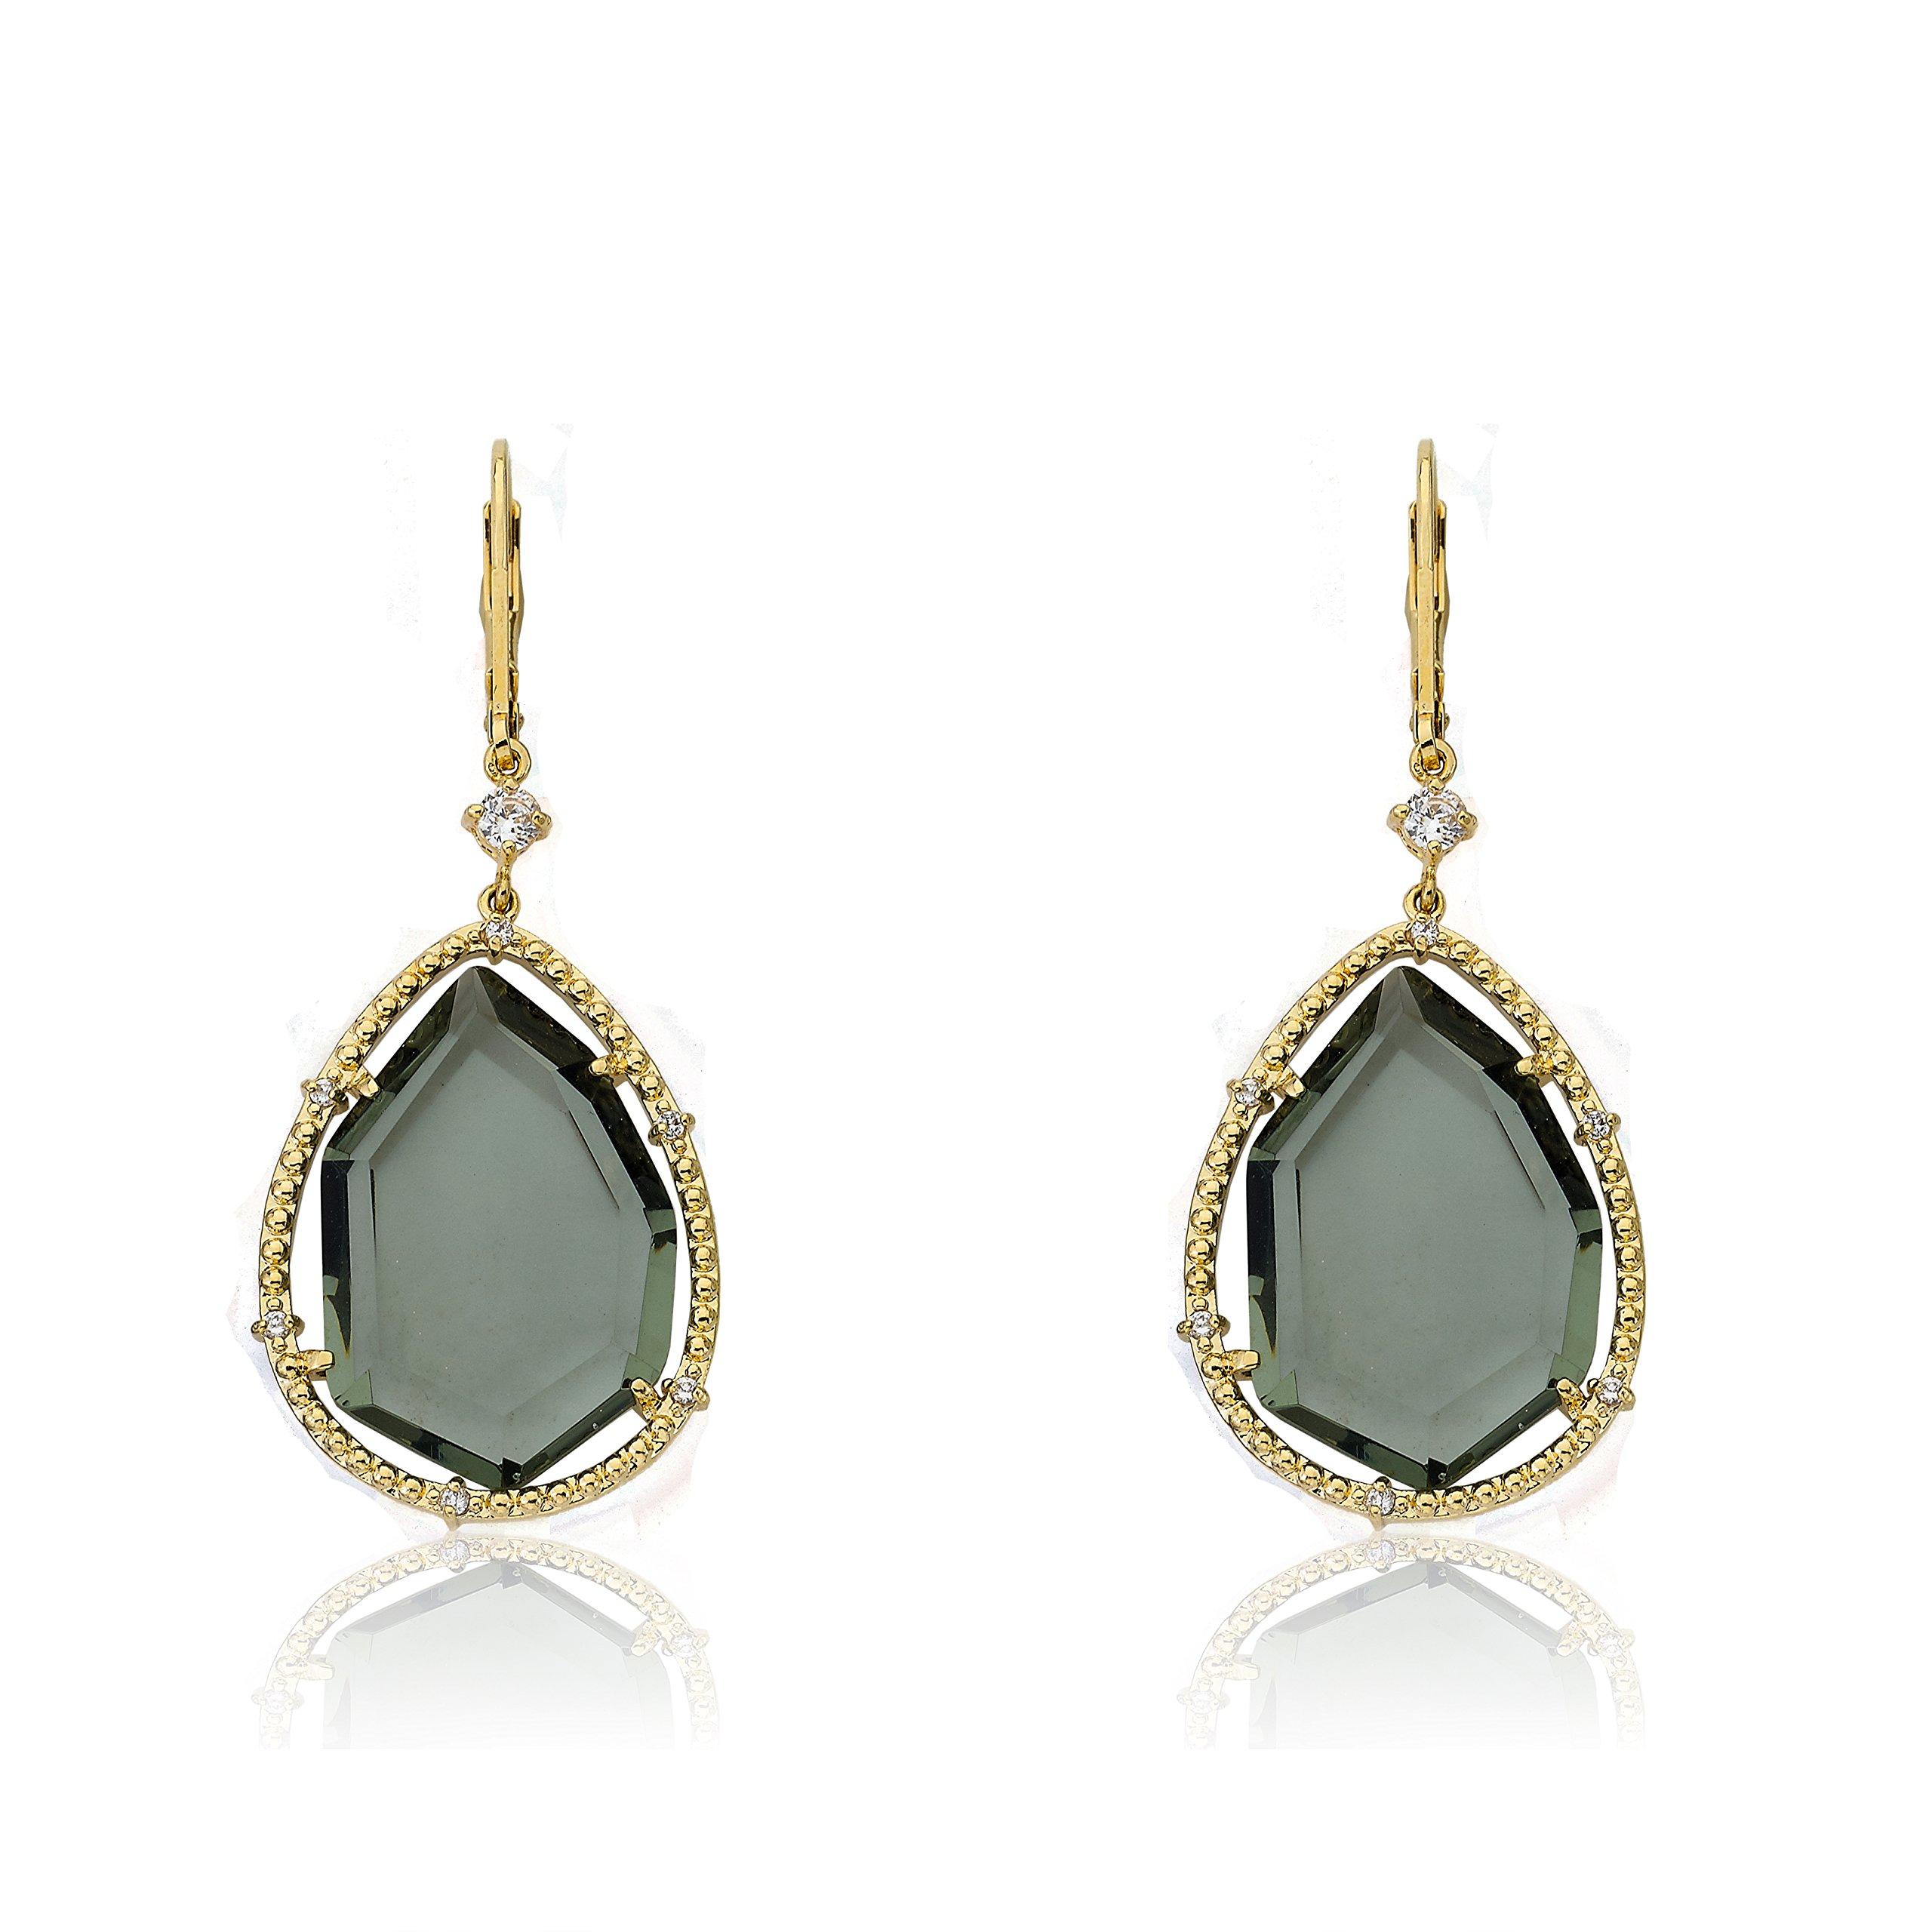 Riccova Sliced Glass 14k Gold-Plated CZ Trimmed Black Sliced Glass Teardrop Dangle Earring